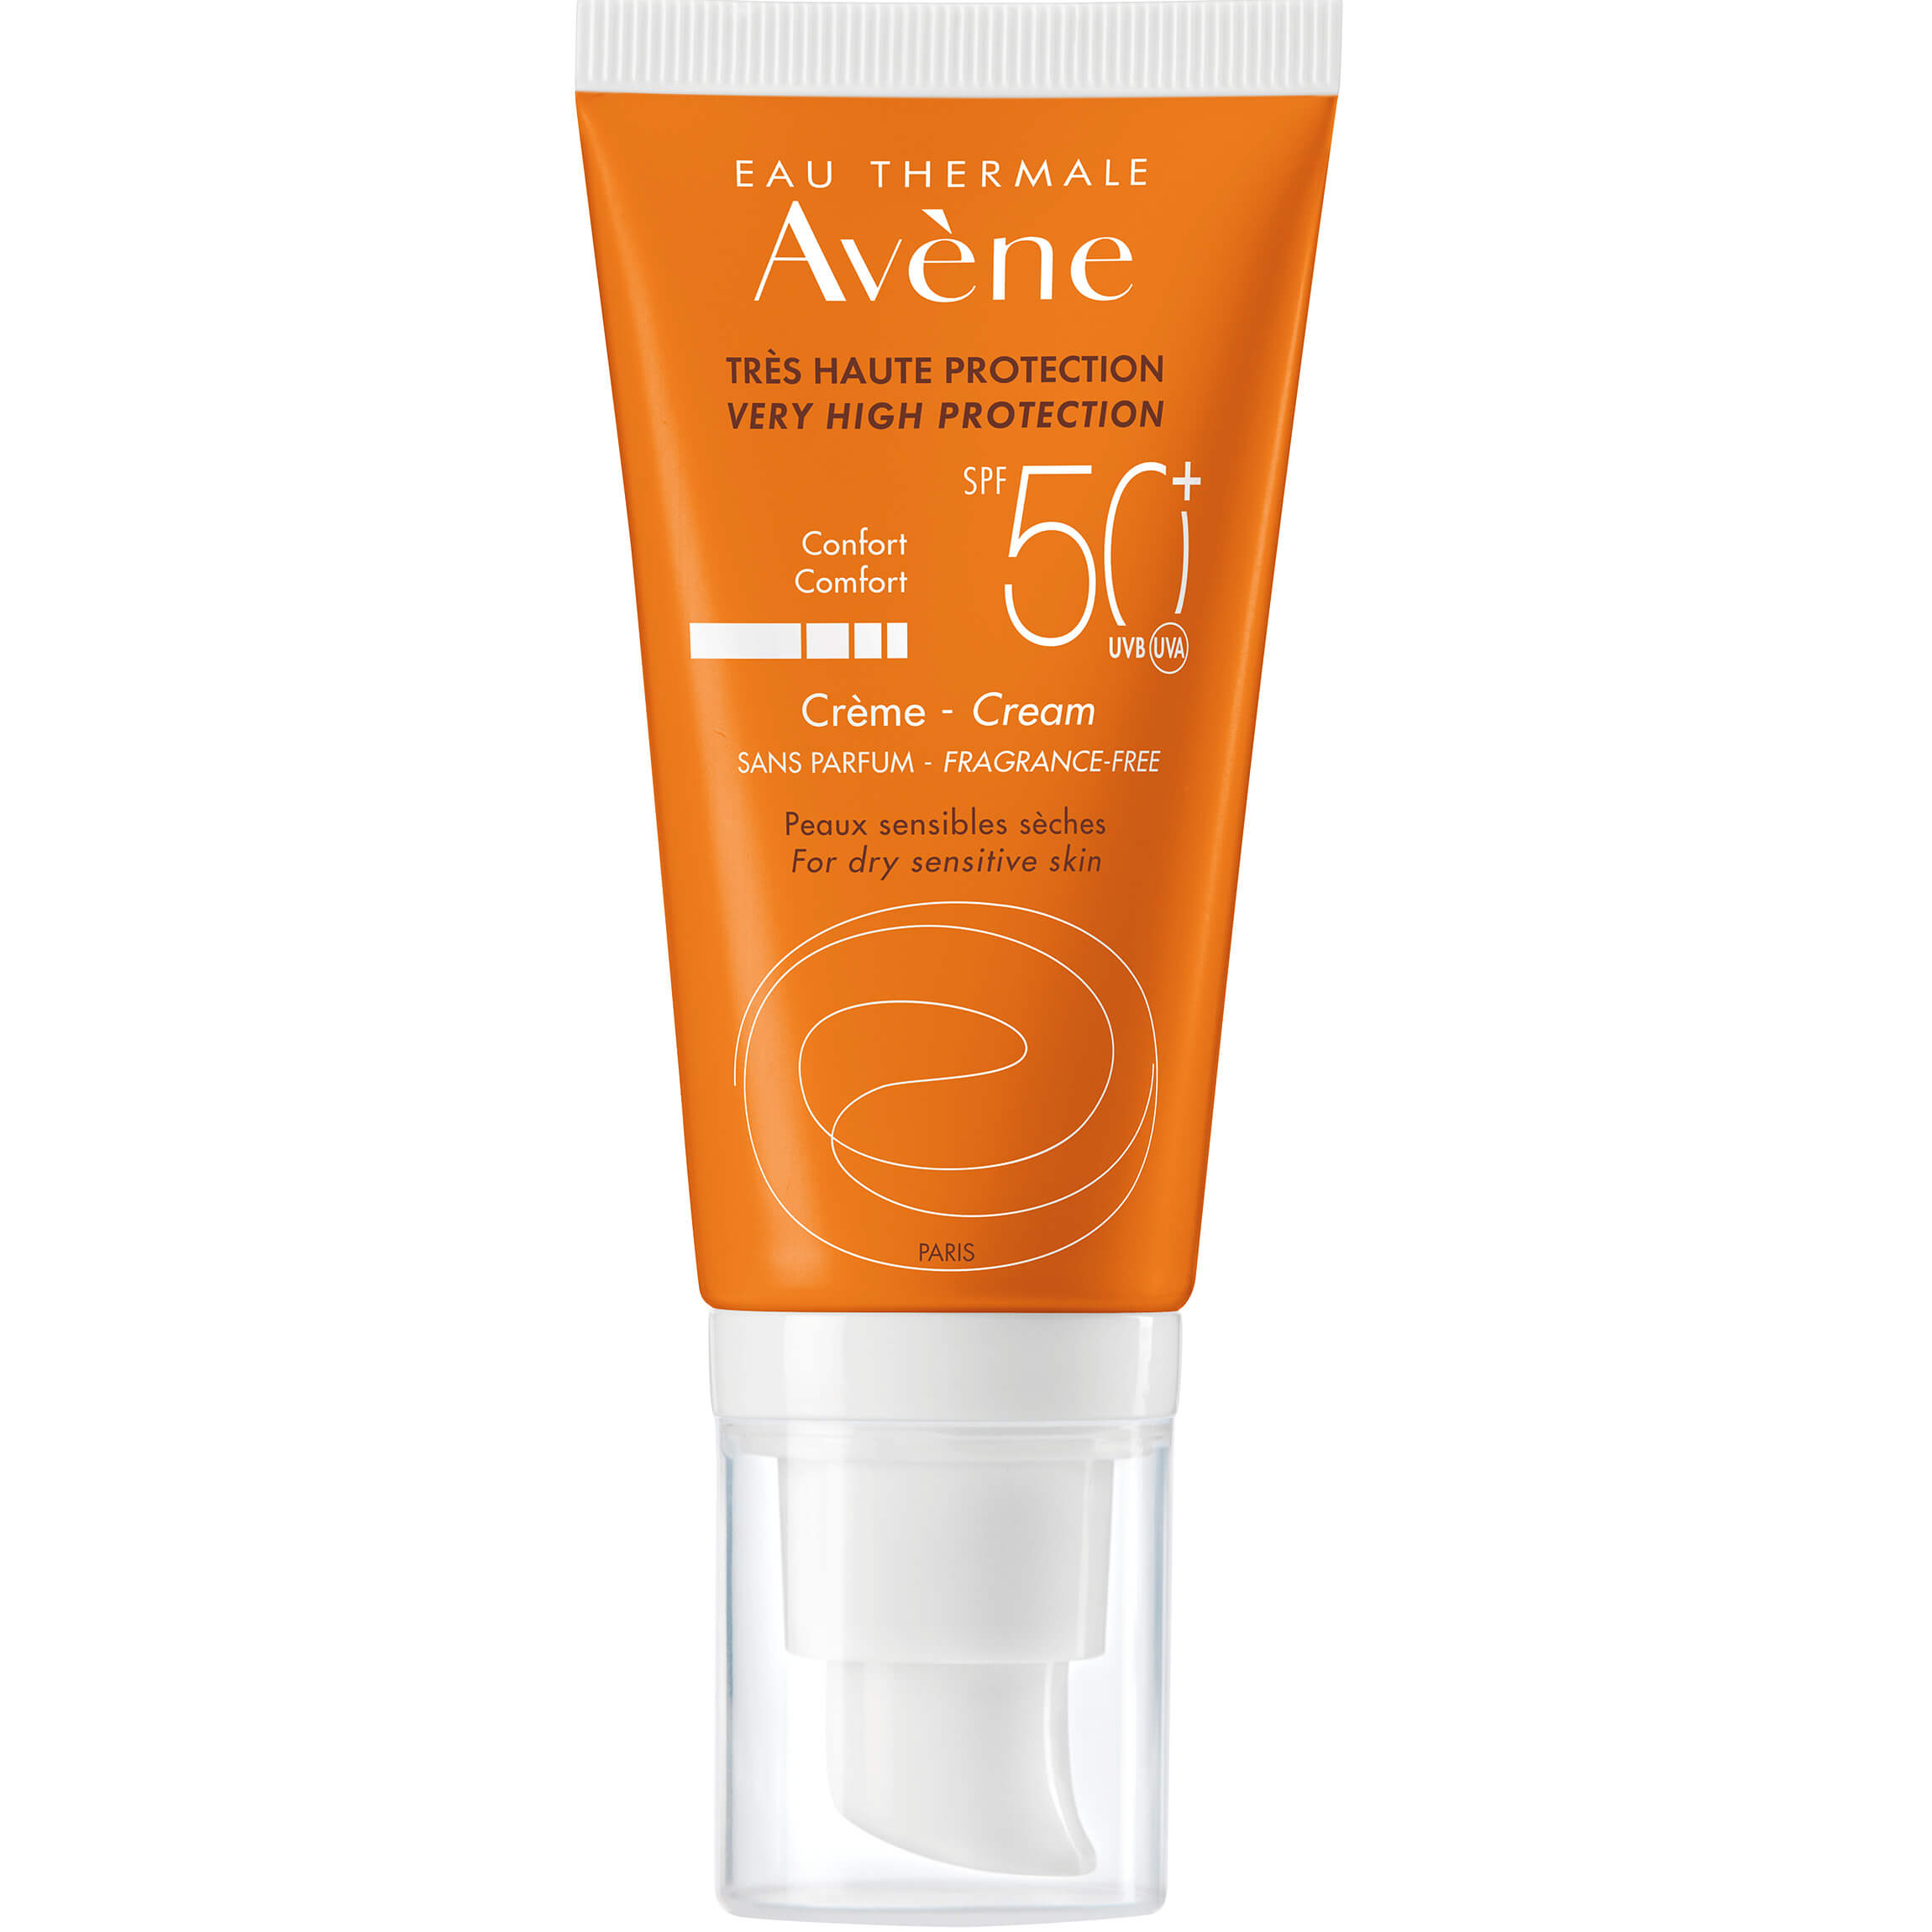 Avene Creme Comfort Spf50+ Αντηλιακή Κρέμα Προσώπου Πολύ Υψηλής ΠροστασίαςΧωρίς Άρωμα για Ξηρή – Ευαίσθητη Επιδερμίδα50ml